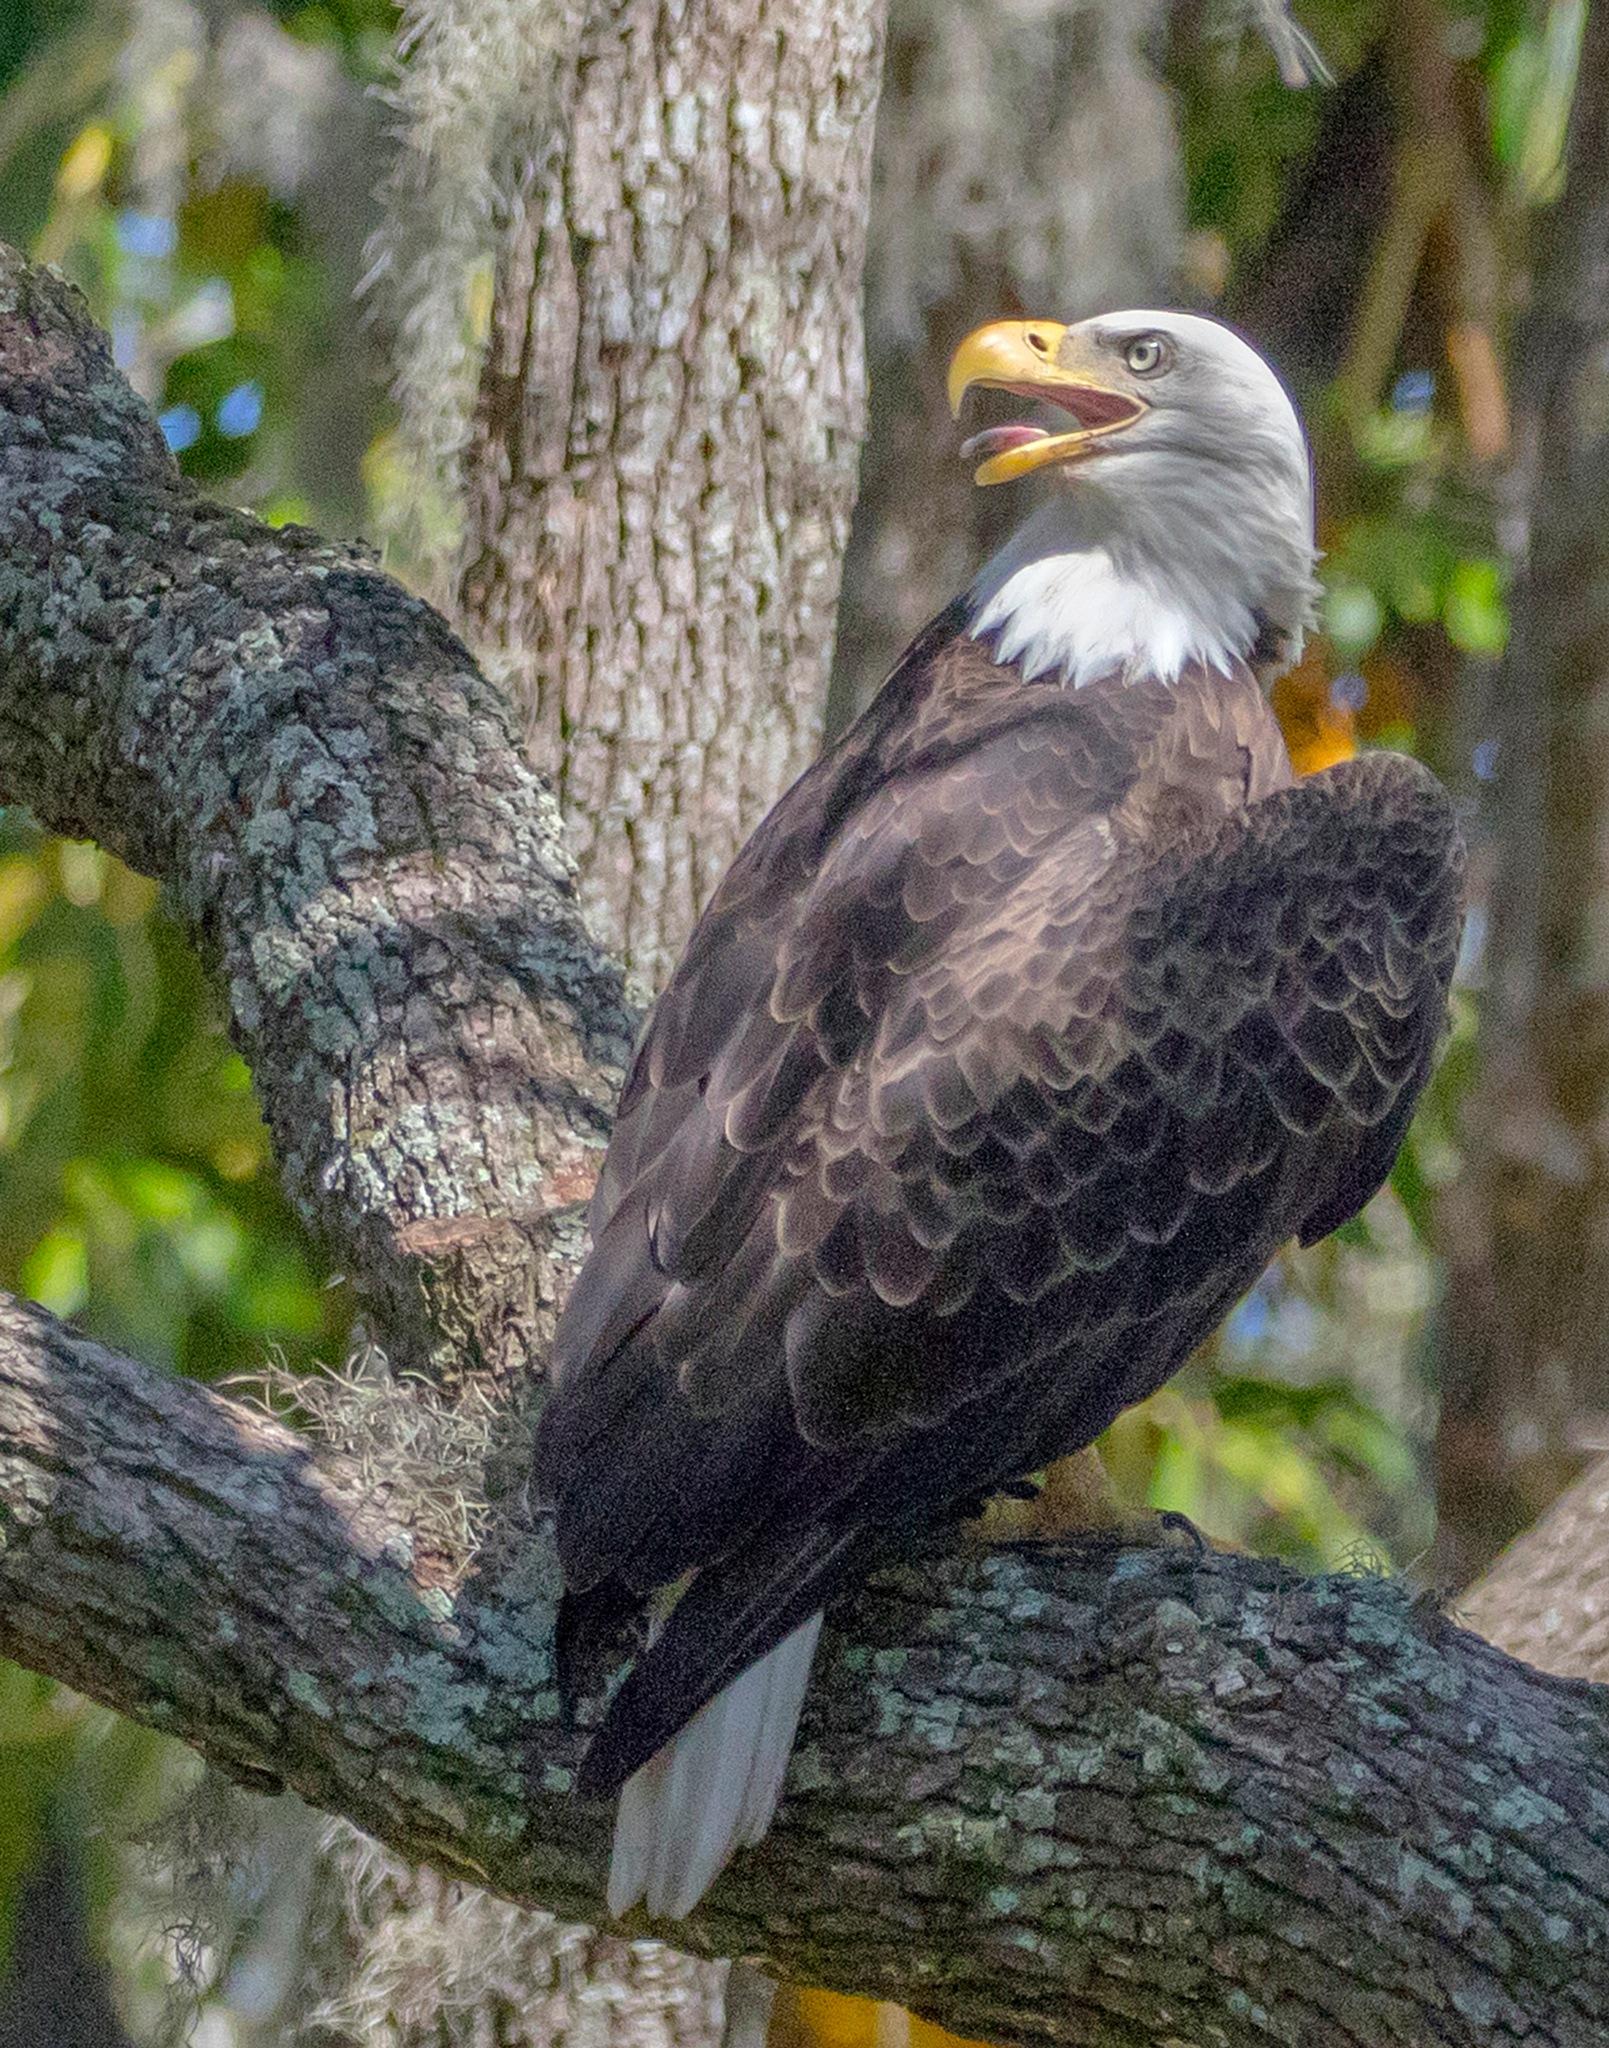 Bald Eagle just finished dinner by askdrferguson